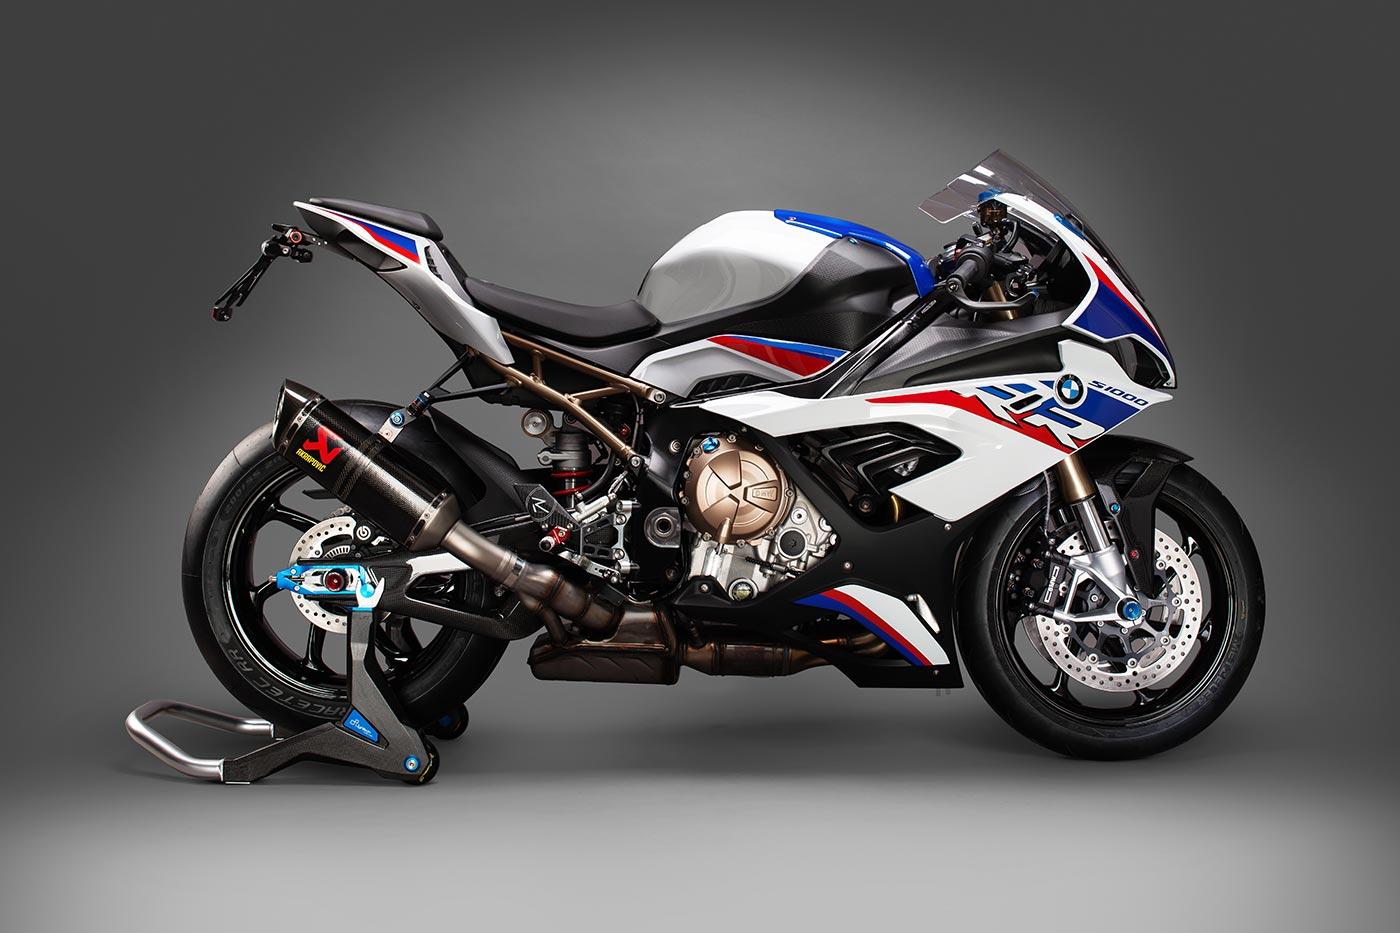 accessori Lightech per BMW S1000RR